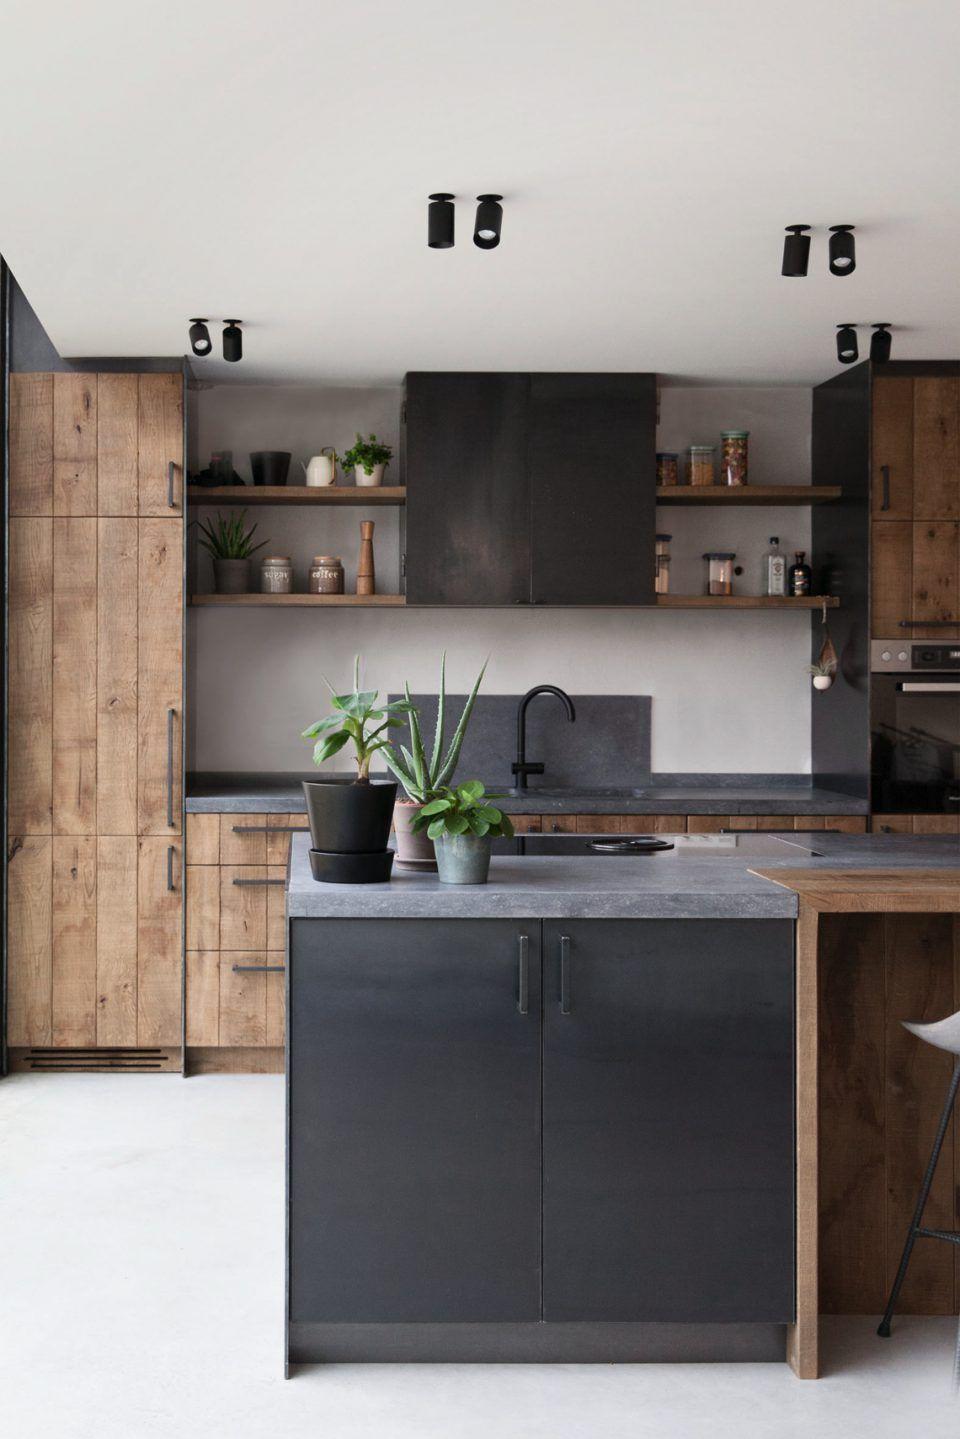 Project Messine Hoog Exclusieve Woon En Tuin Inspiratie Cuisine Moderne Cuisine Design Moderne Idée Déco Cuisine